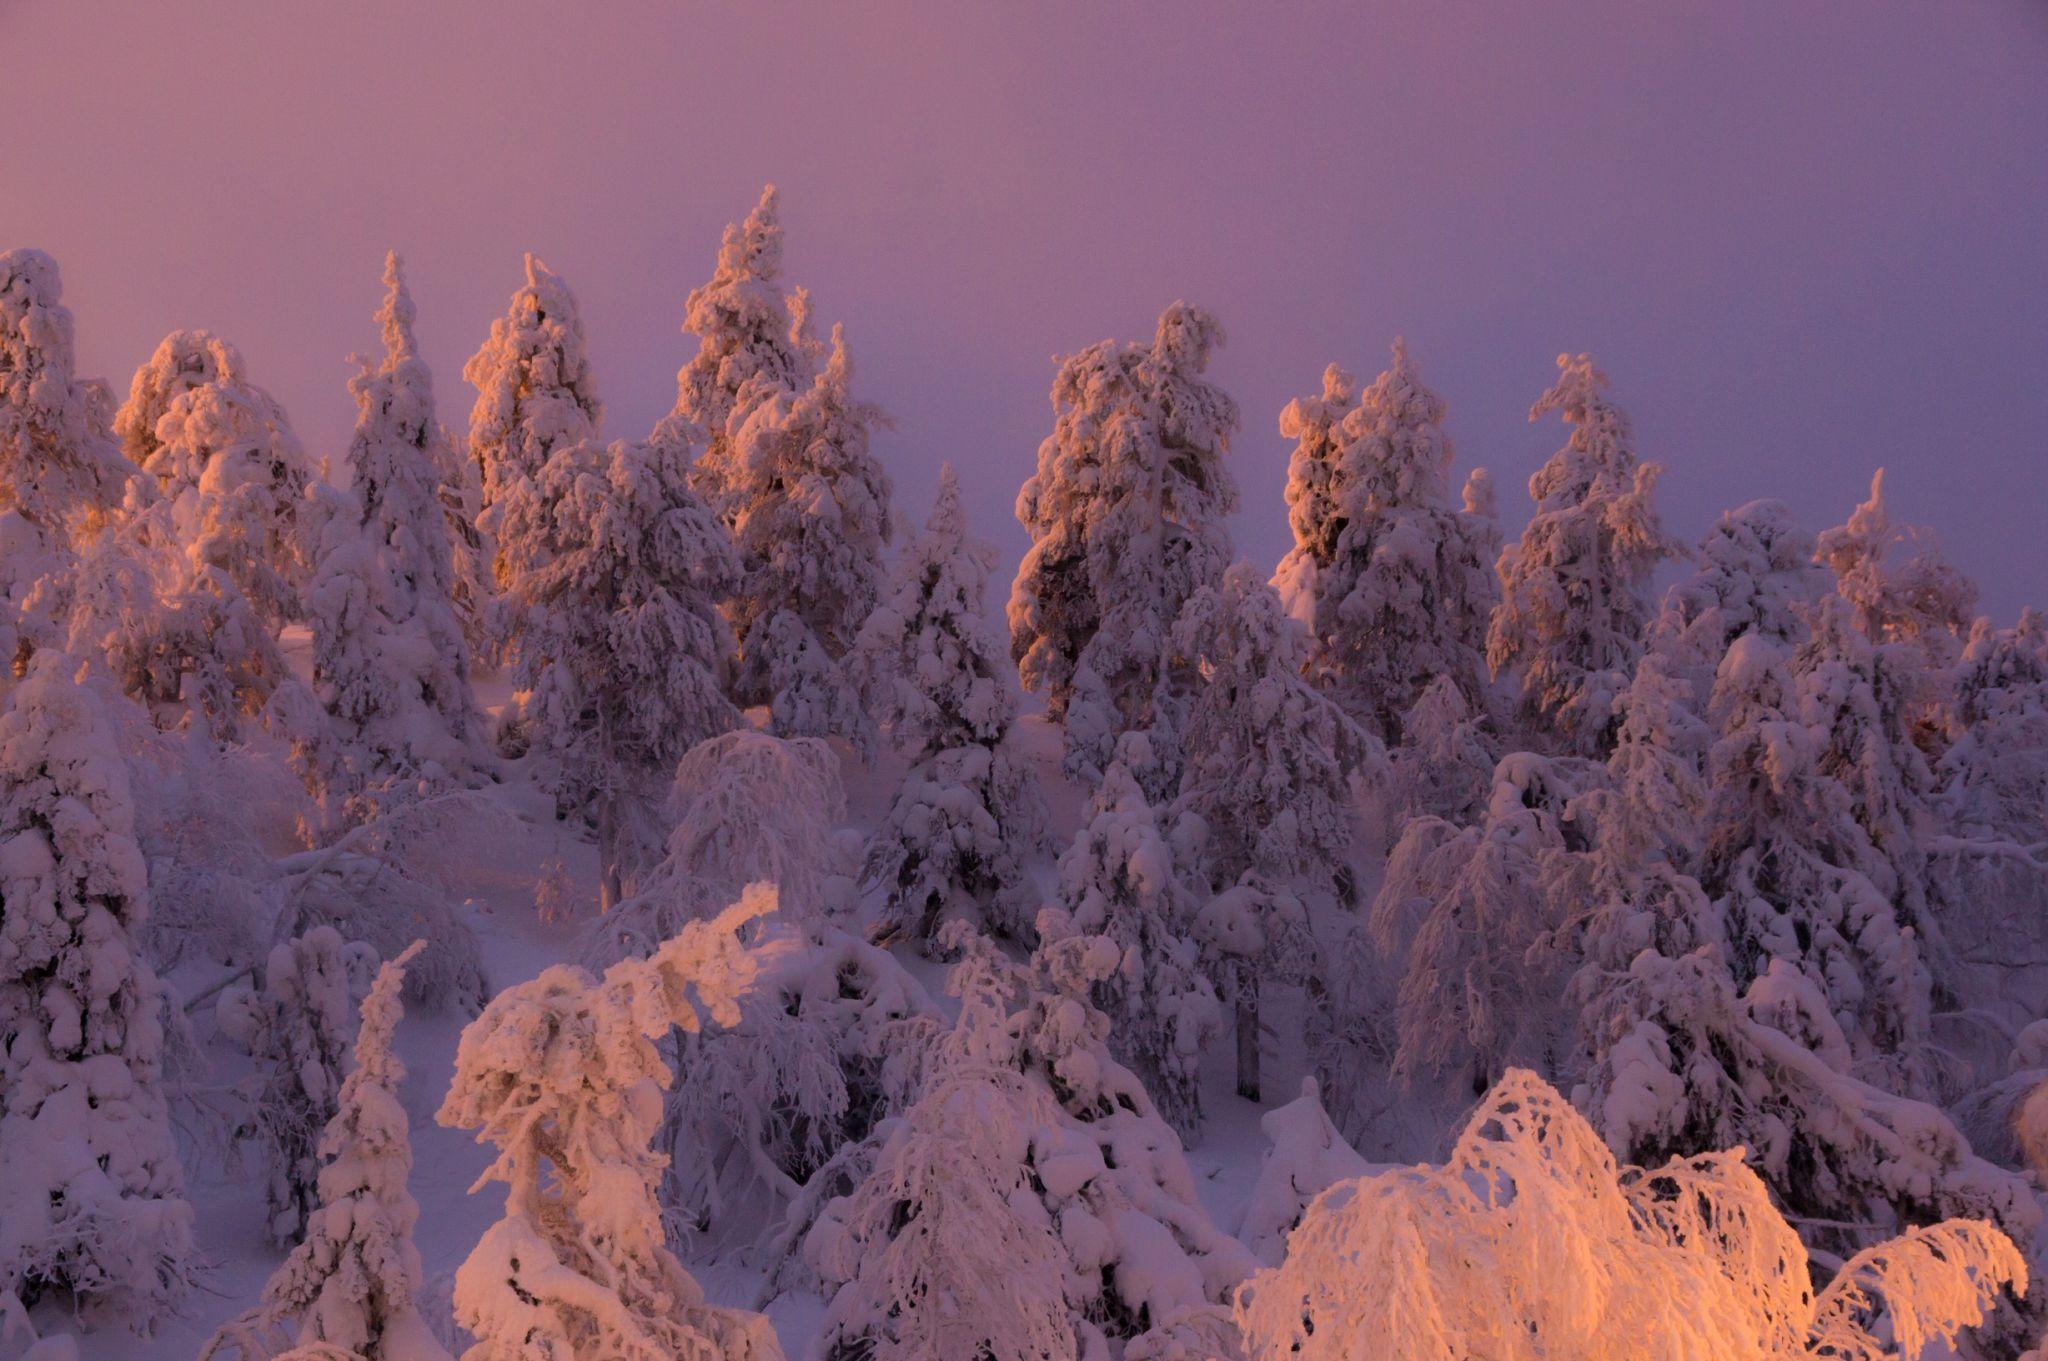 Winter wonderland, Kuusamo, Finland